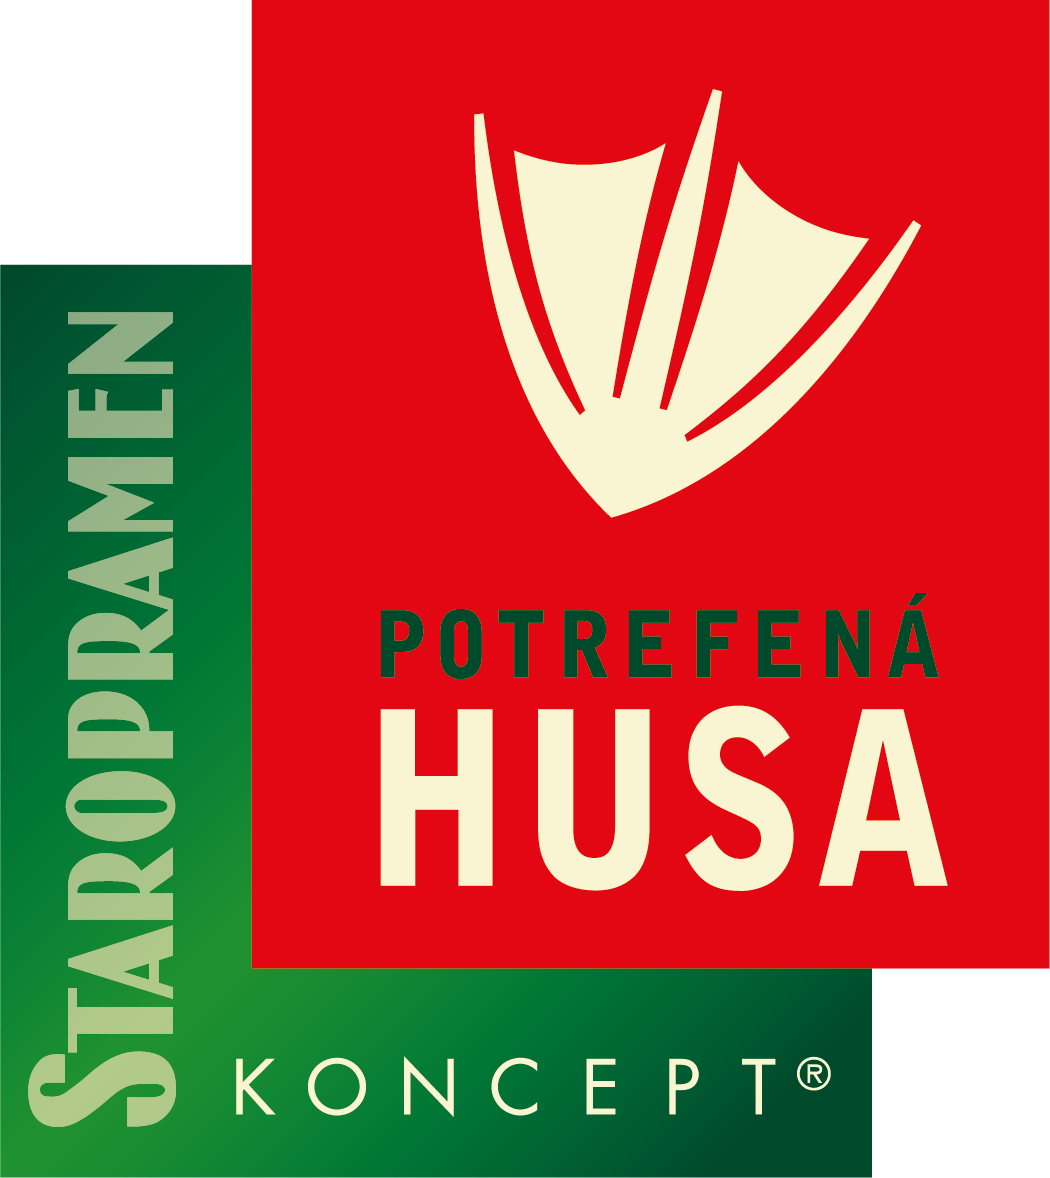 1_PotrefenaHusa